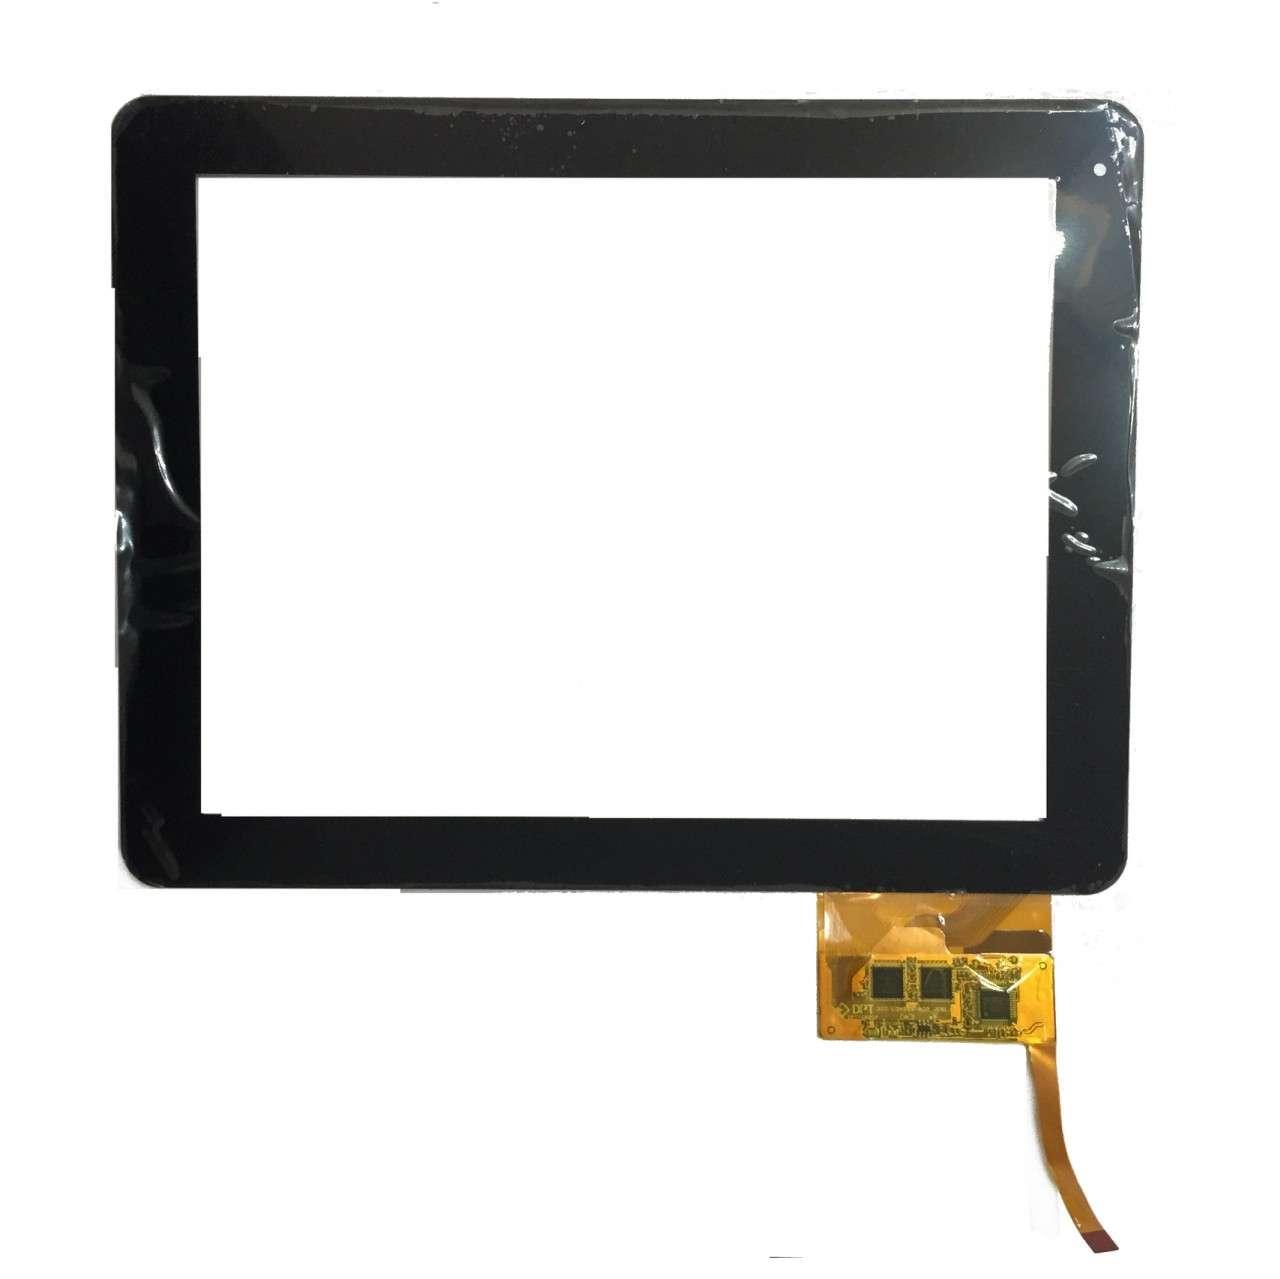 Touchscreen Digitizer Szenio Tablet PC 3000 Geam Sticla Tableta imagine powerlaptop.ro 2021